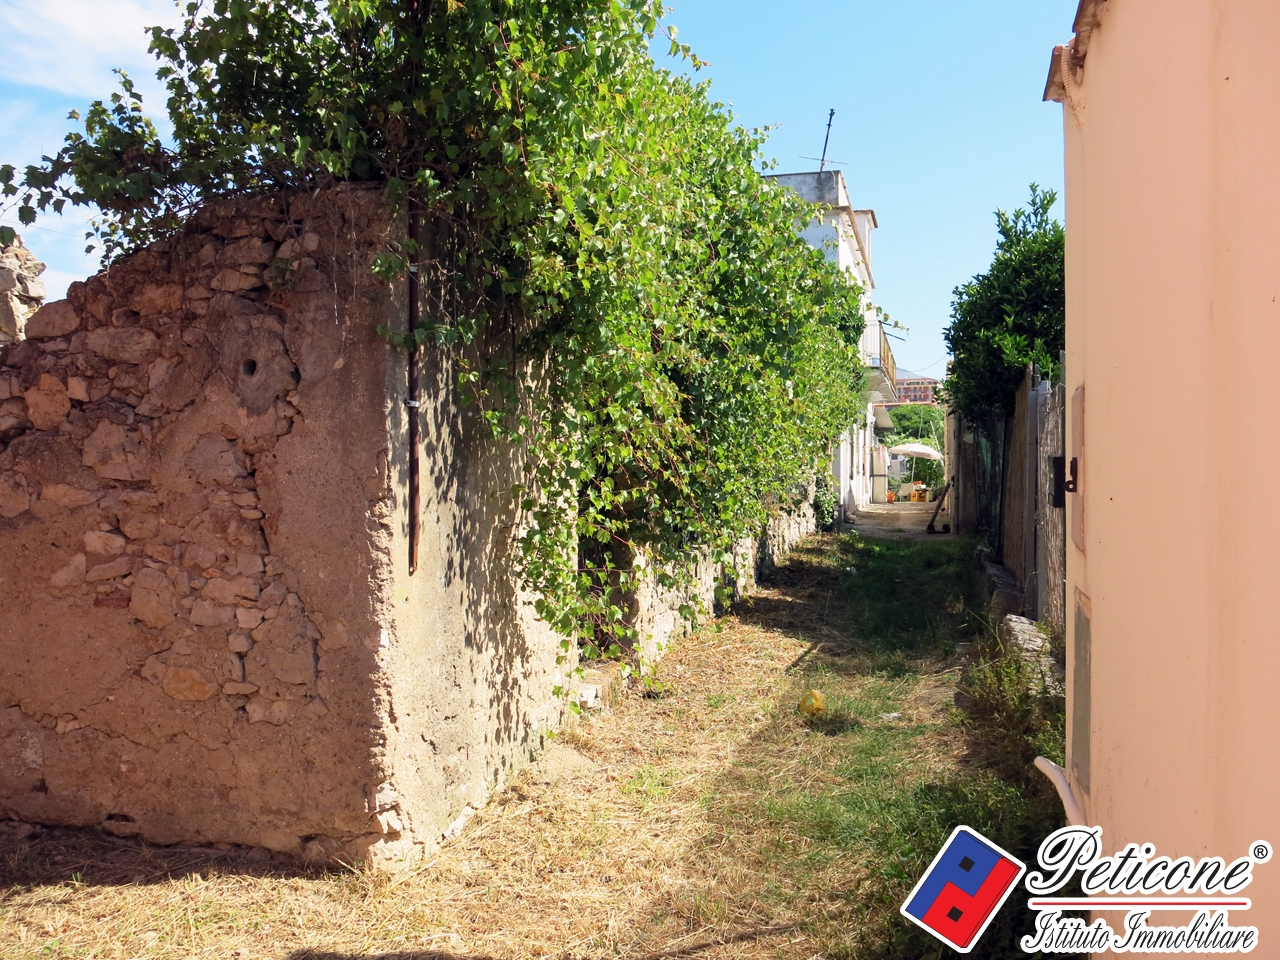 Villa in Vendita a Gaeta: 5 locali, 250 mq - Foto 23